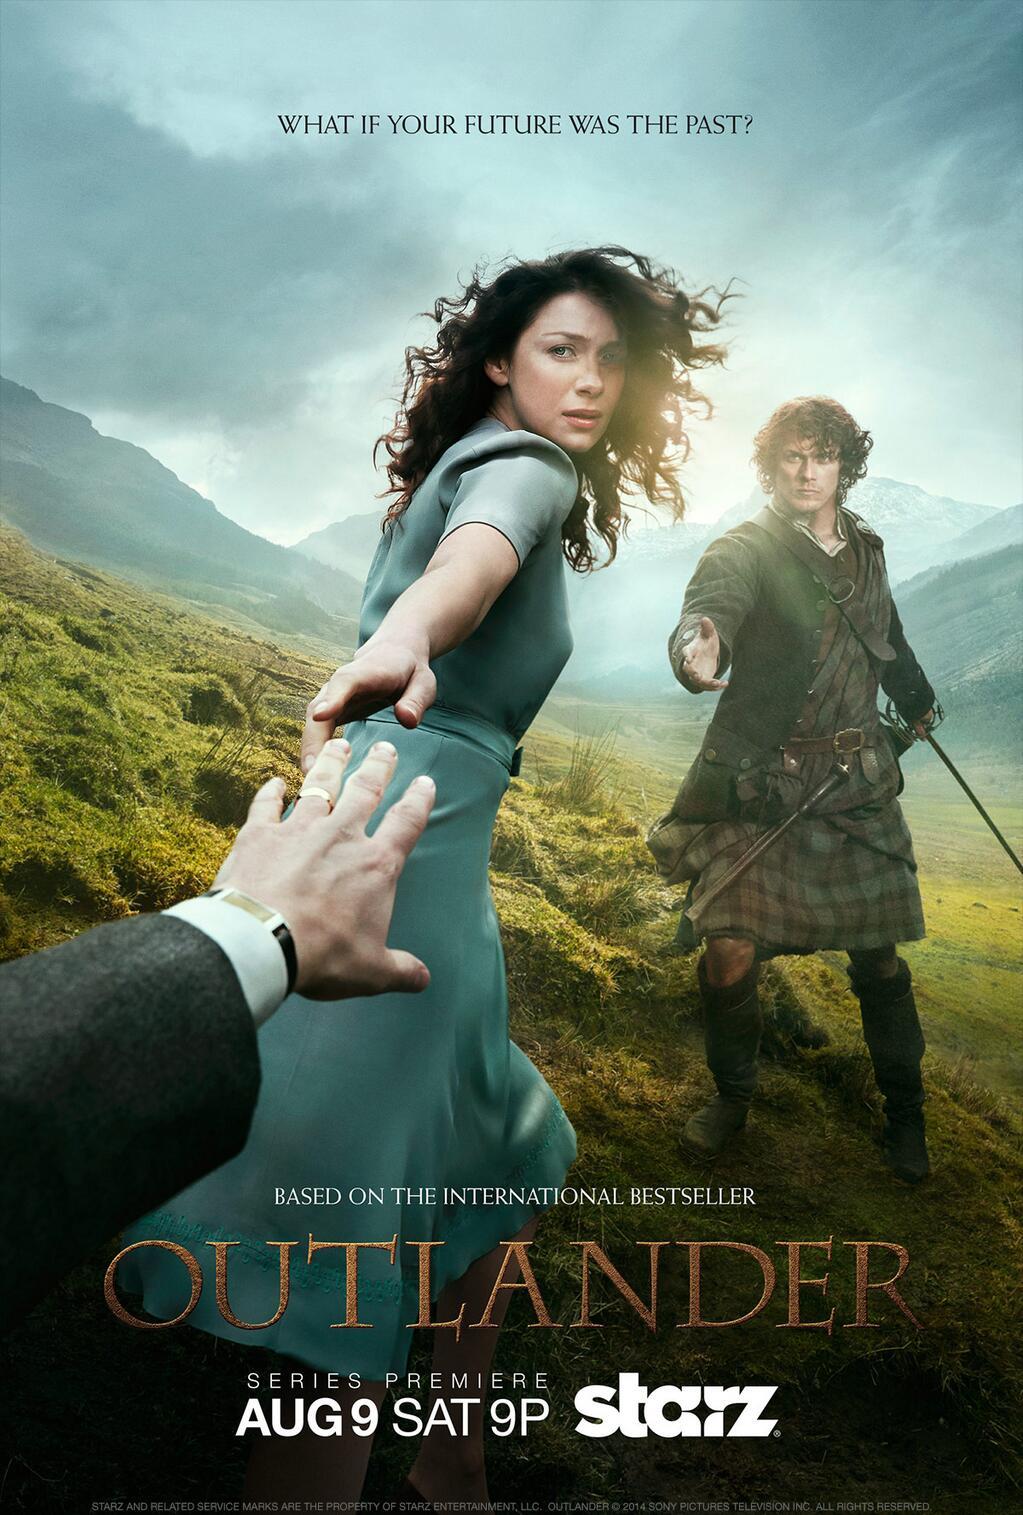 'Outlander' key art